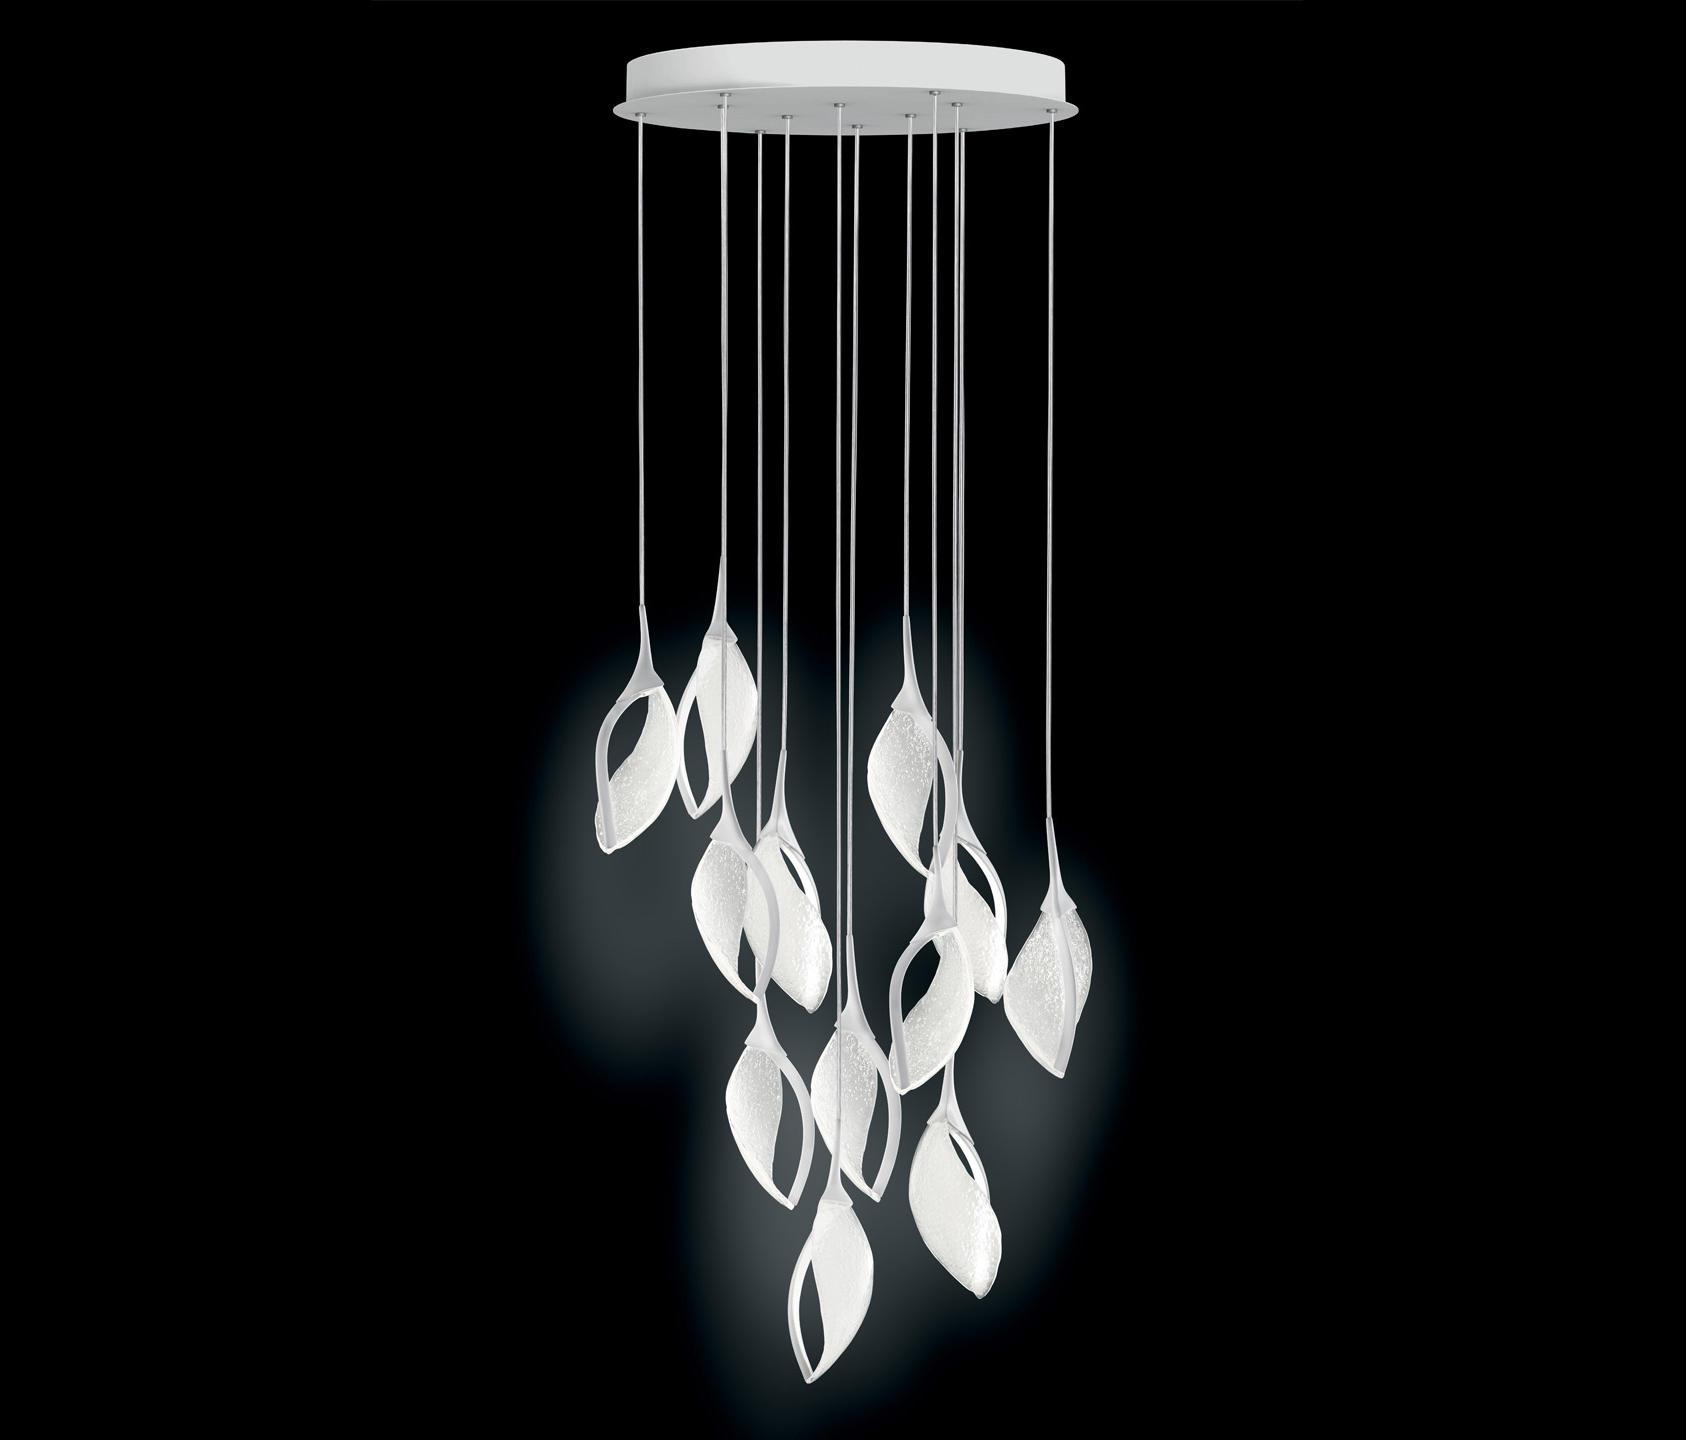 nia 12 s led pendelleuchten von leucos architonic. Black Bedroom Furniture Sets. Home Design Ideas